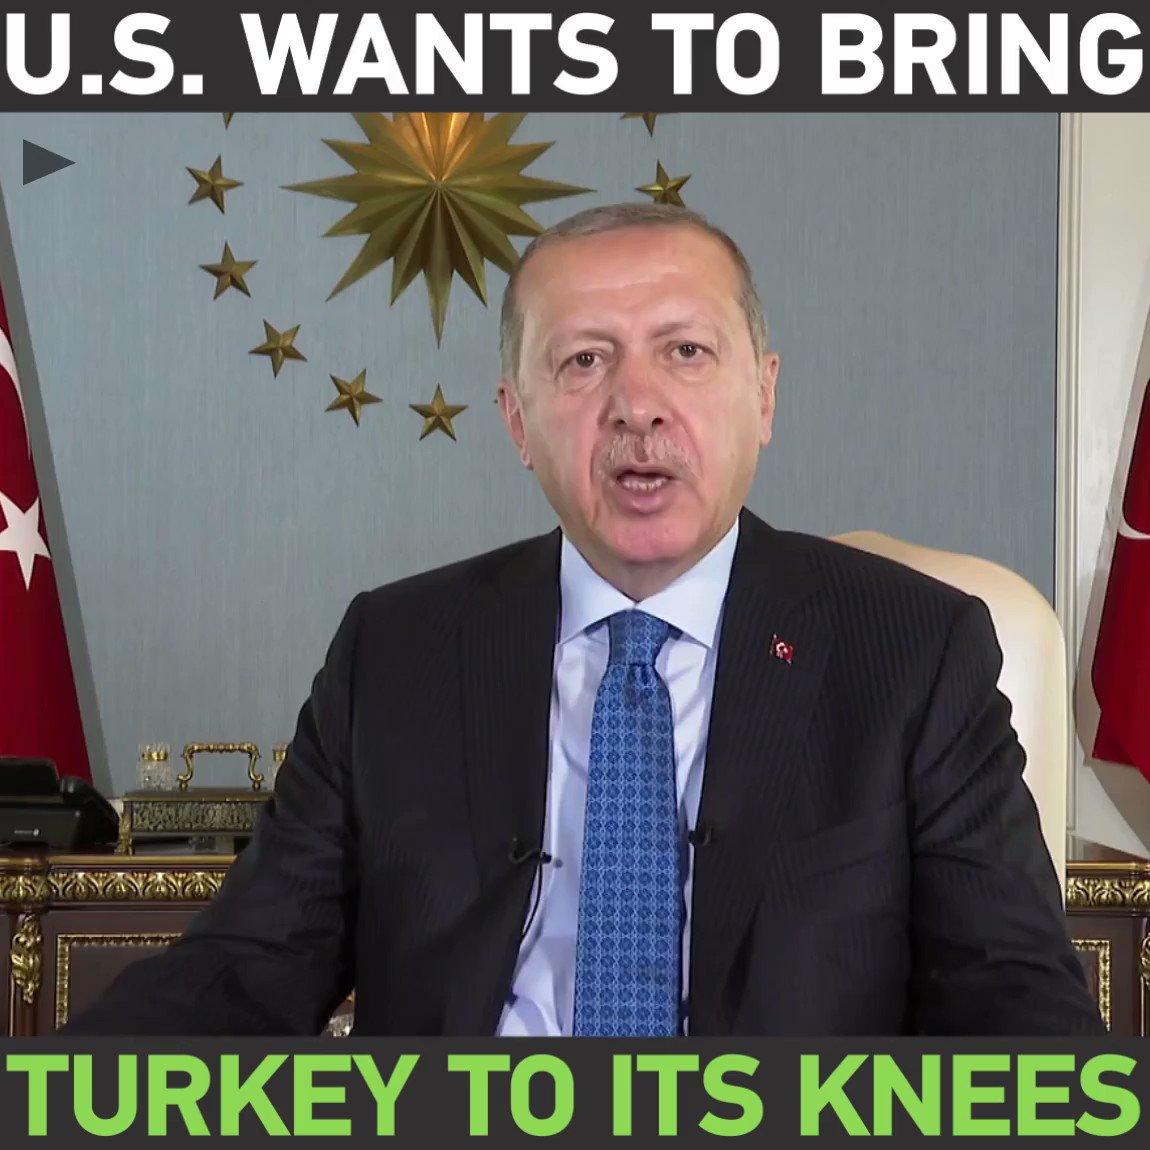 U.S. wants to bring Turkey to its knees – Erdogan